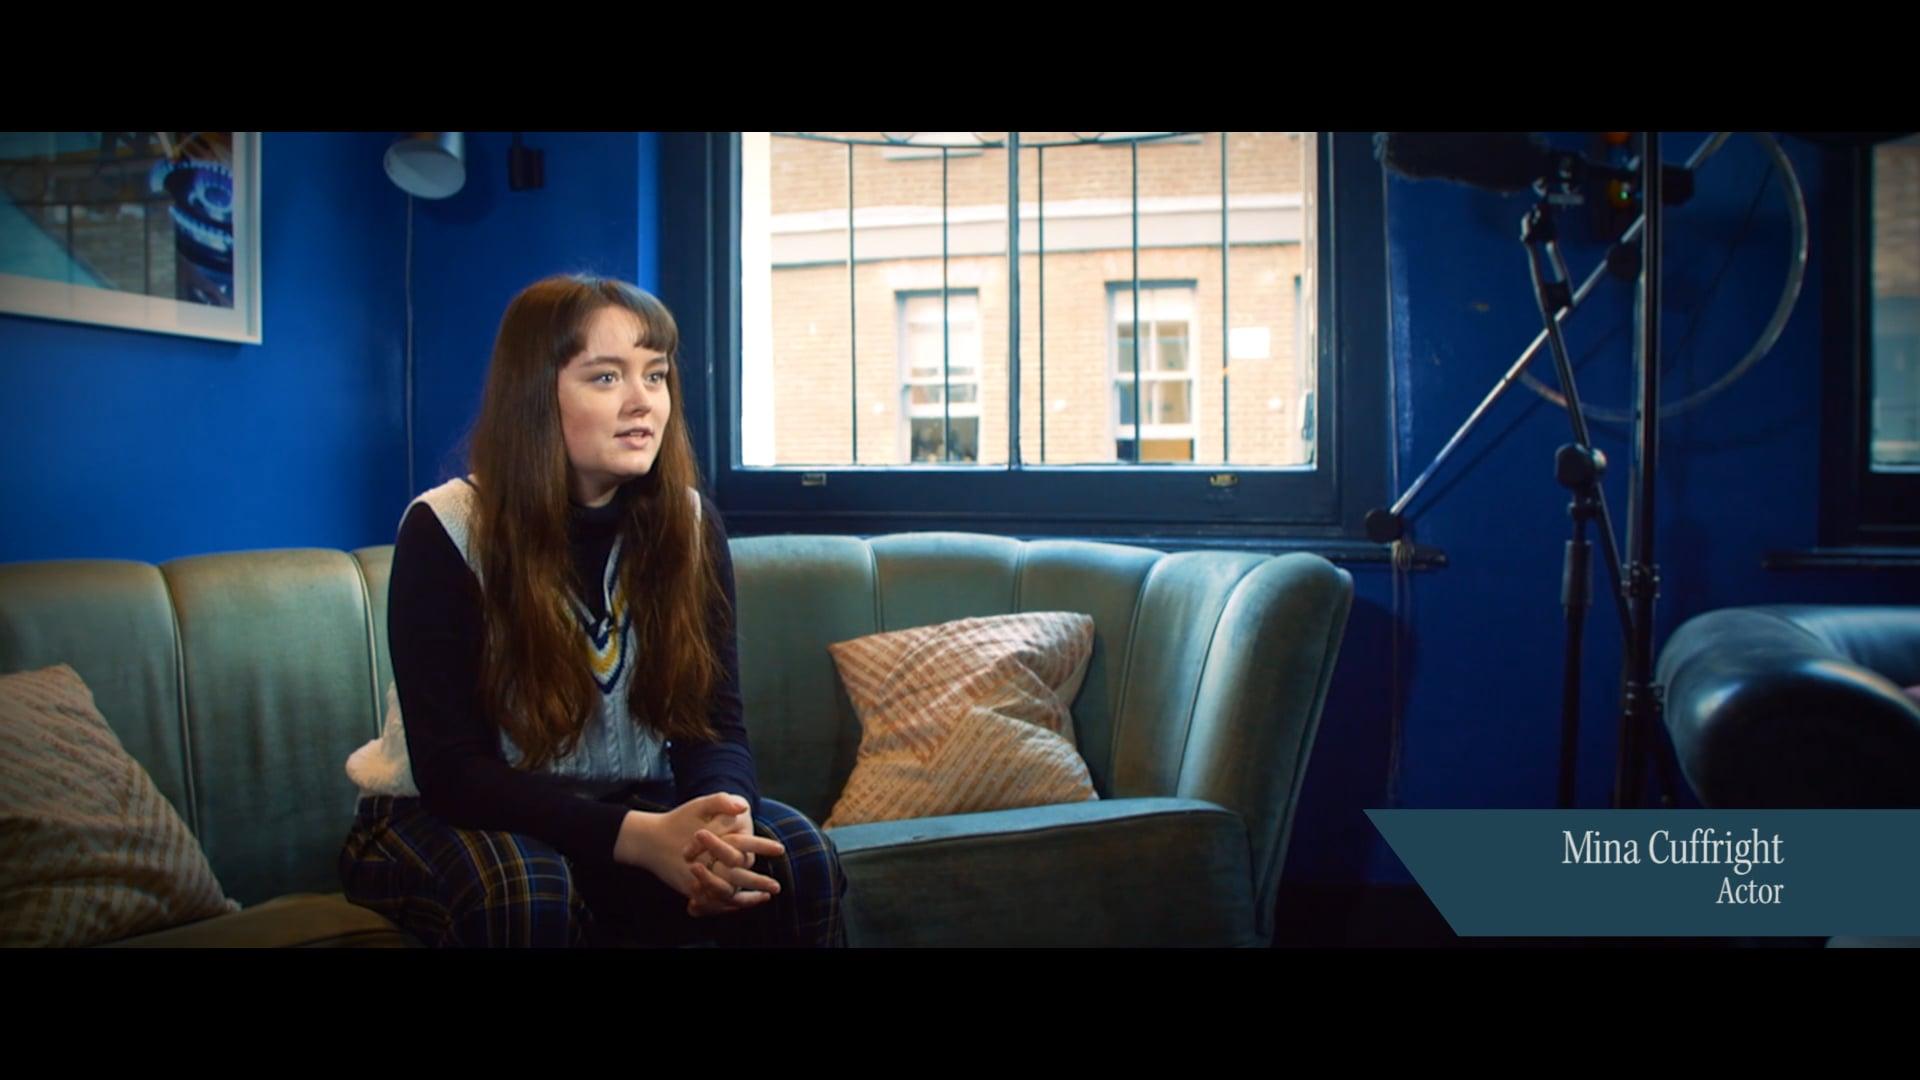 Mina Cuffwright - Actor